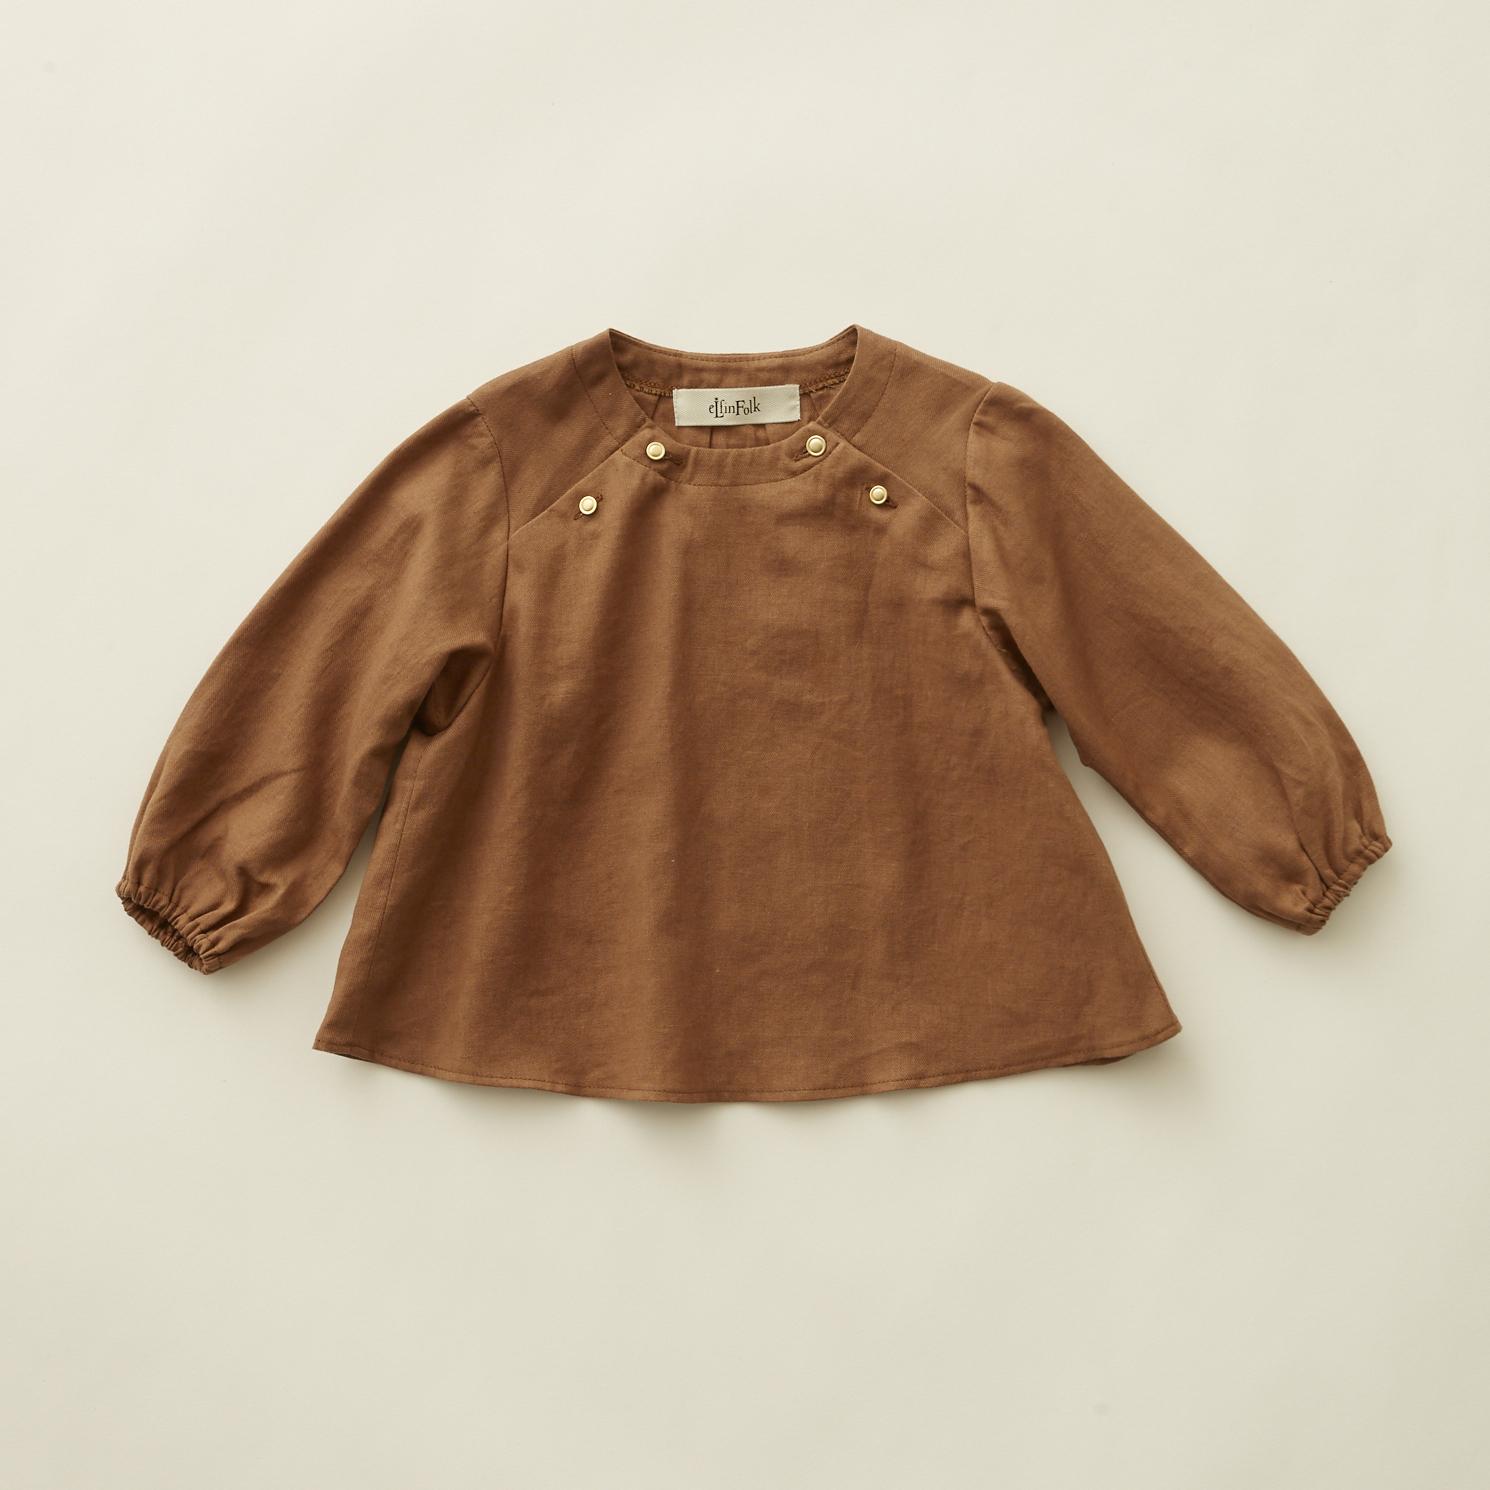 《eLfinFolk 2020AW》C/L washer  baby blouse / brown / 80-100cm